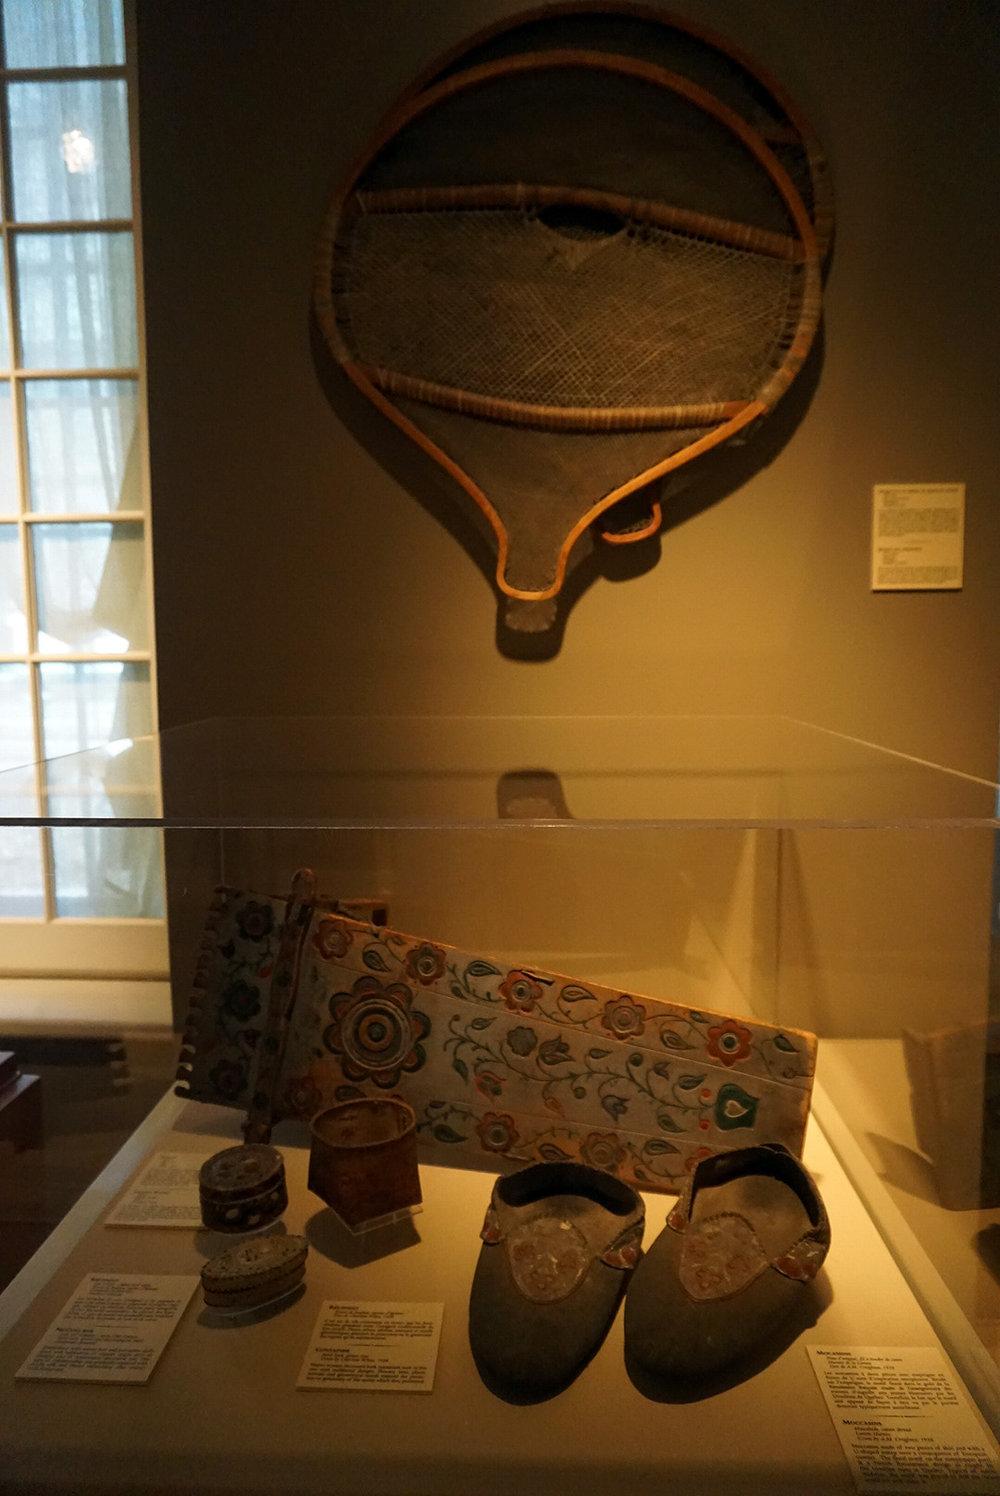 Chateau-Ramezay-Museum-Montreal-Canada-Artwork-Traveller-Travel-Blogger-Lifestyle-LINDATENCHITRAN-3-1616X1080.jpg